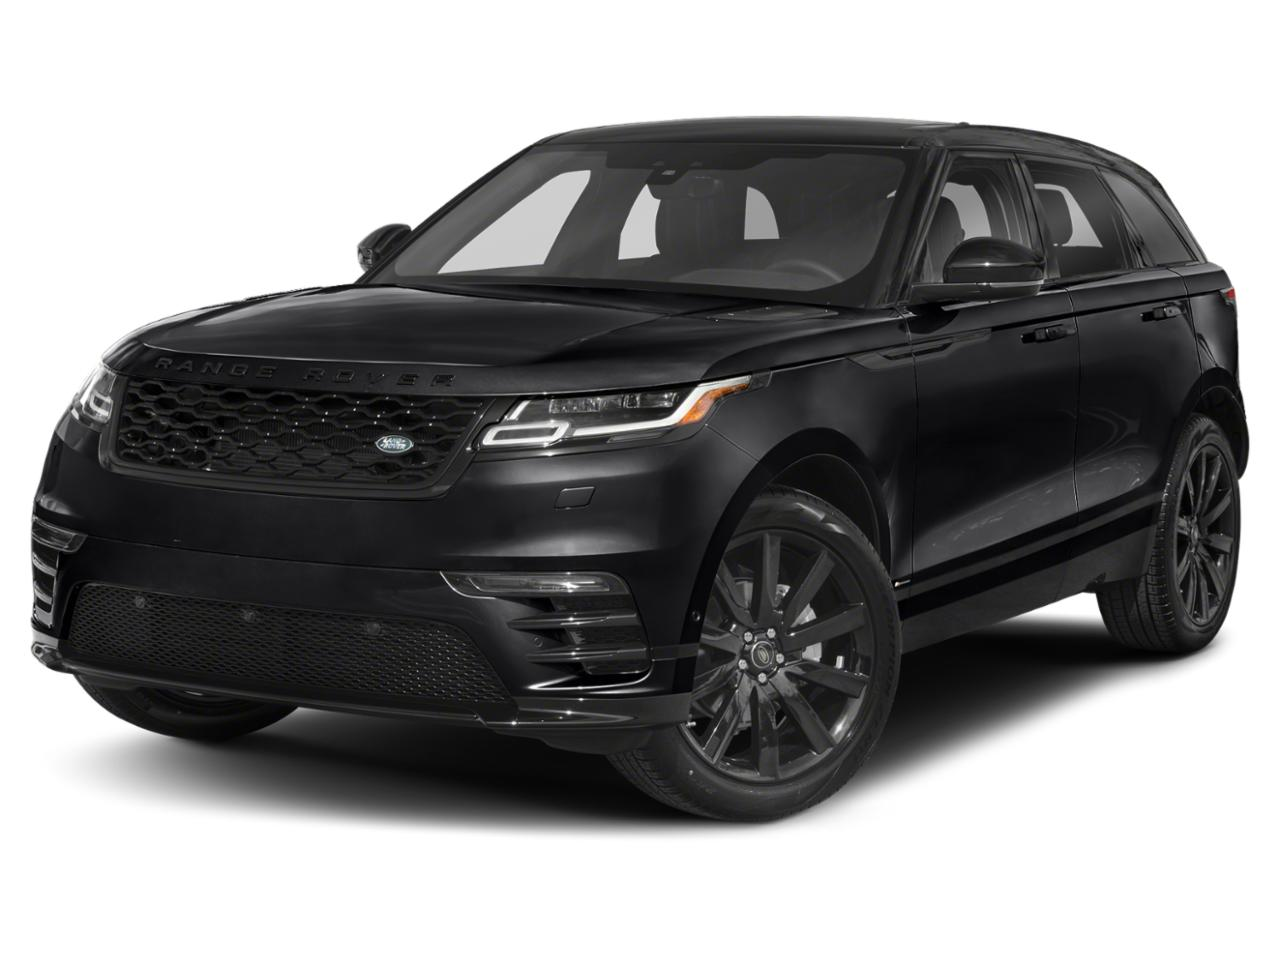 2018 Land Rover Range Rover Velar Vehicle Photo in SAN ANGELO, TX 76903-5798